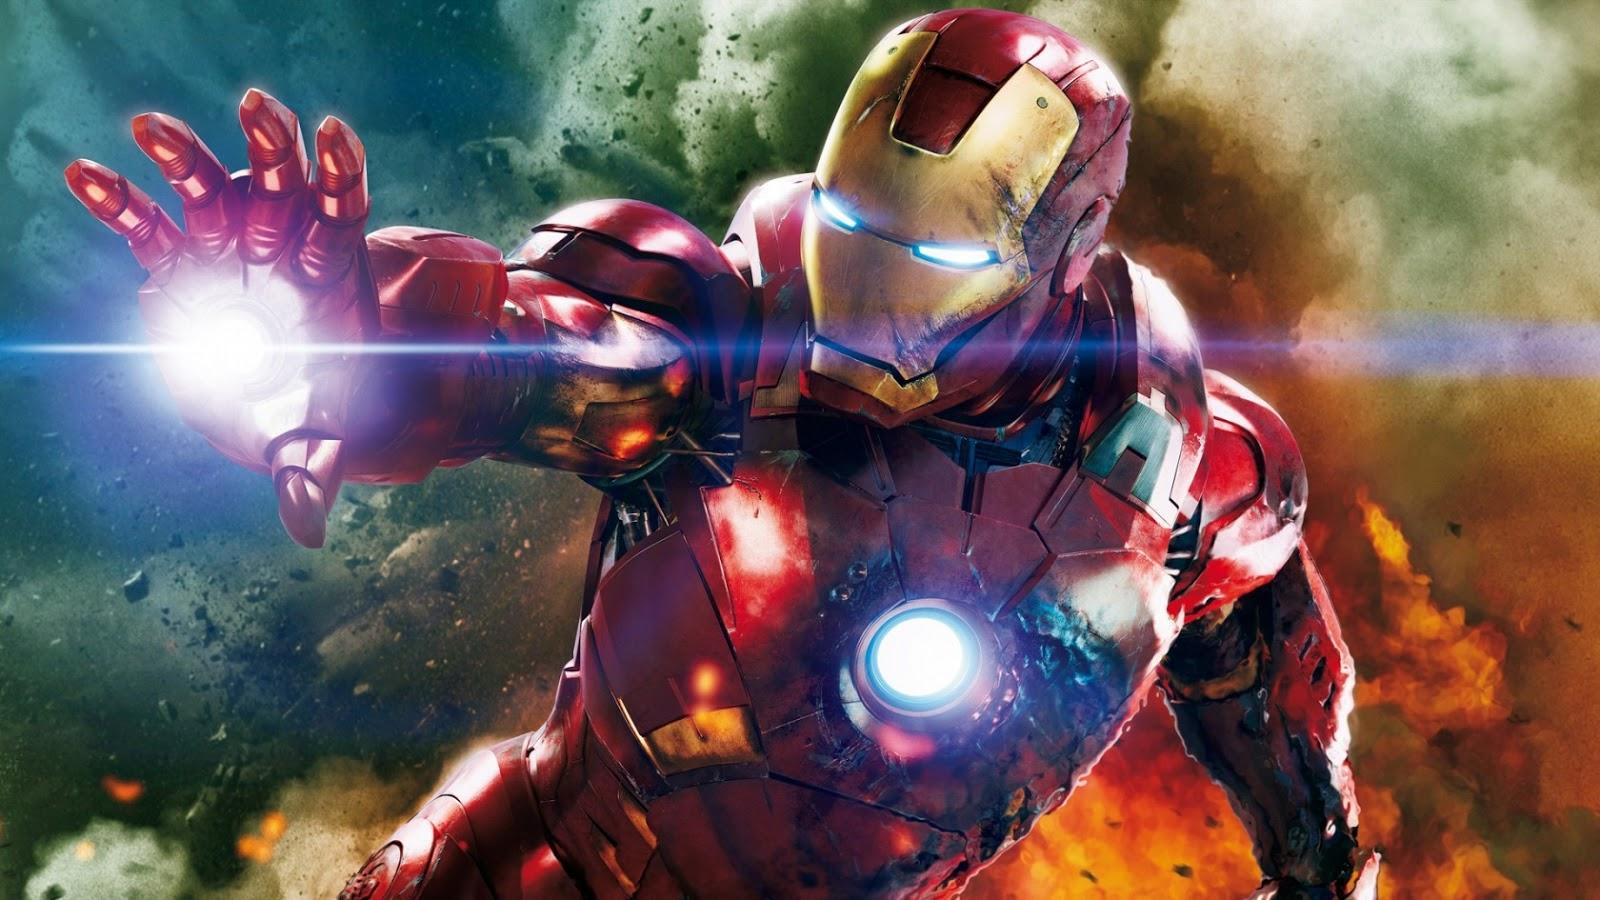 Iron Man 3 Wallpaper